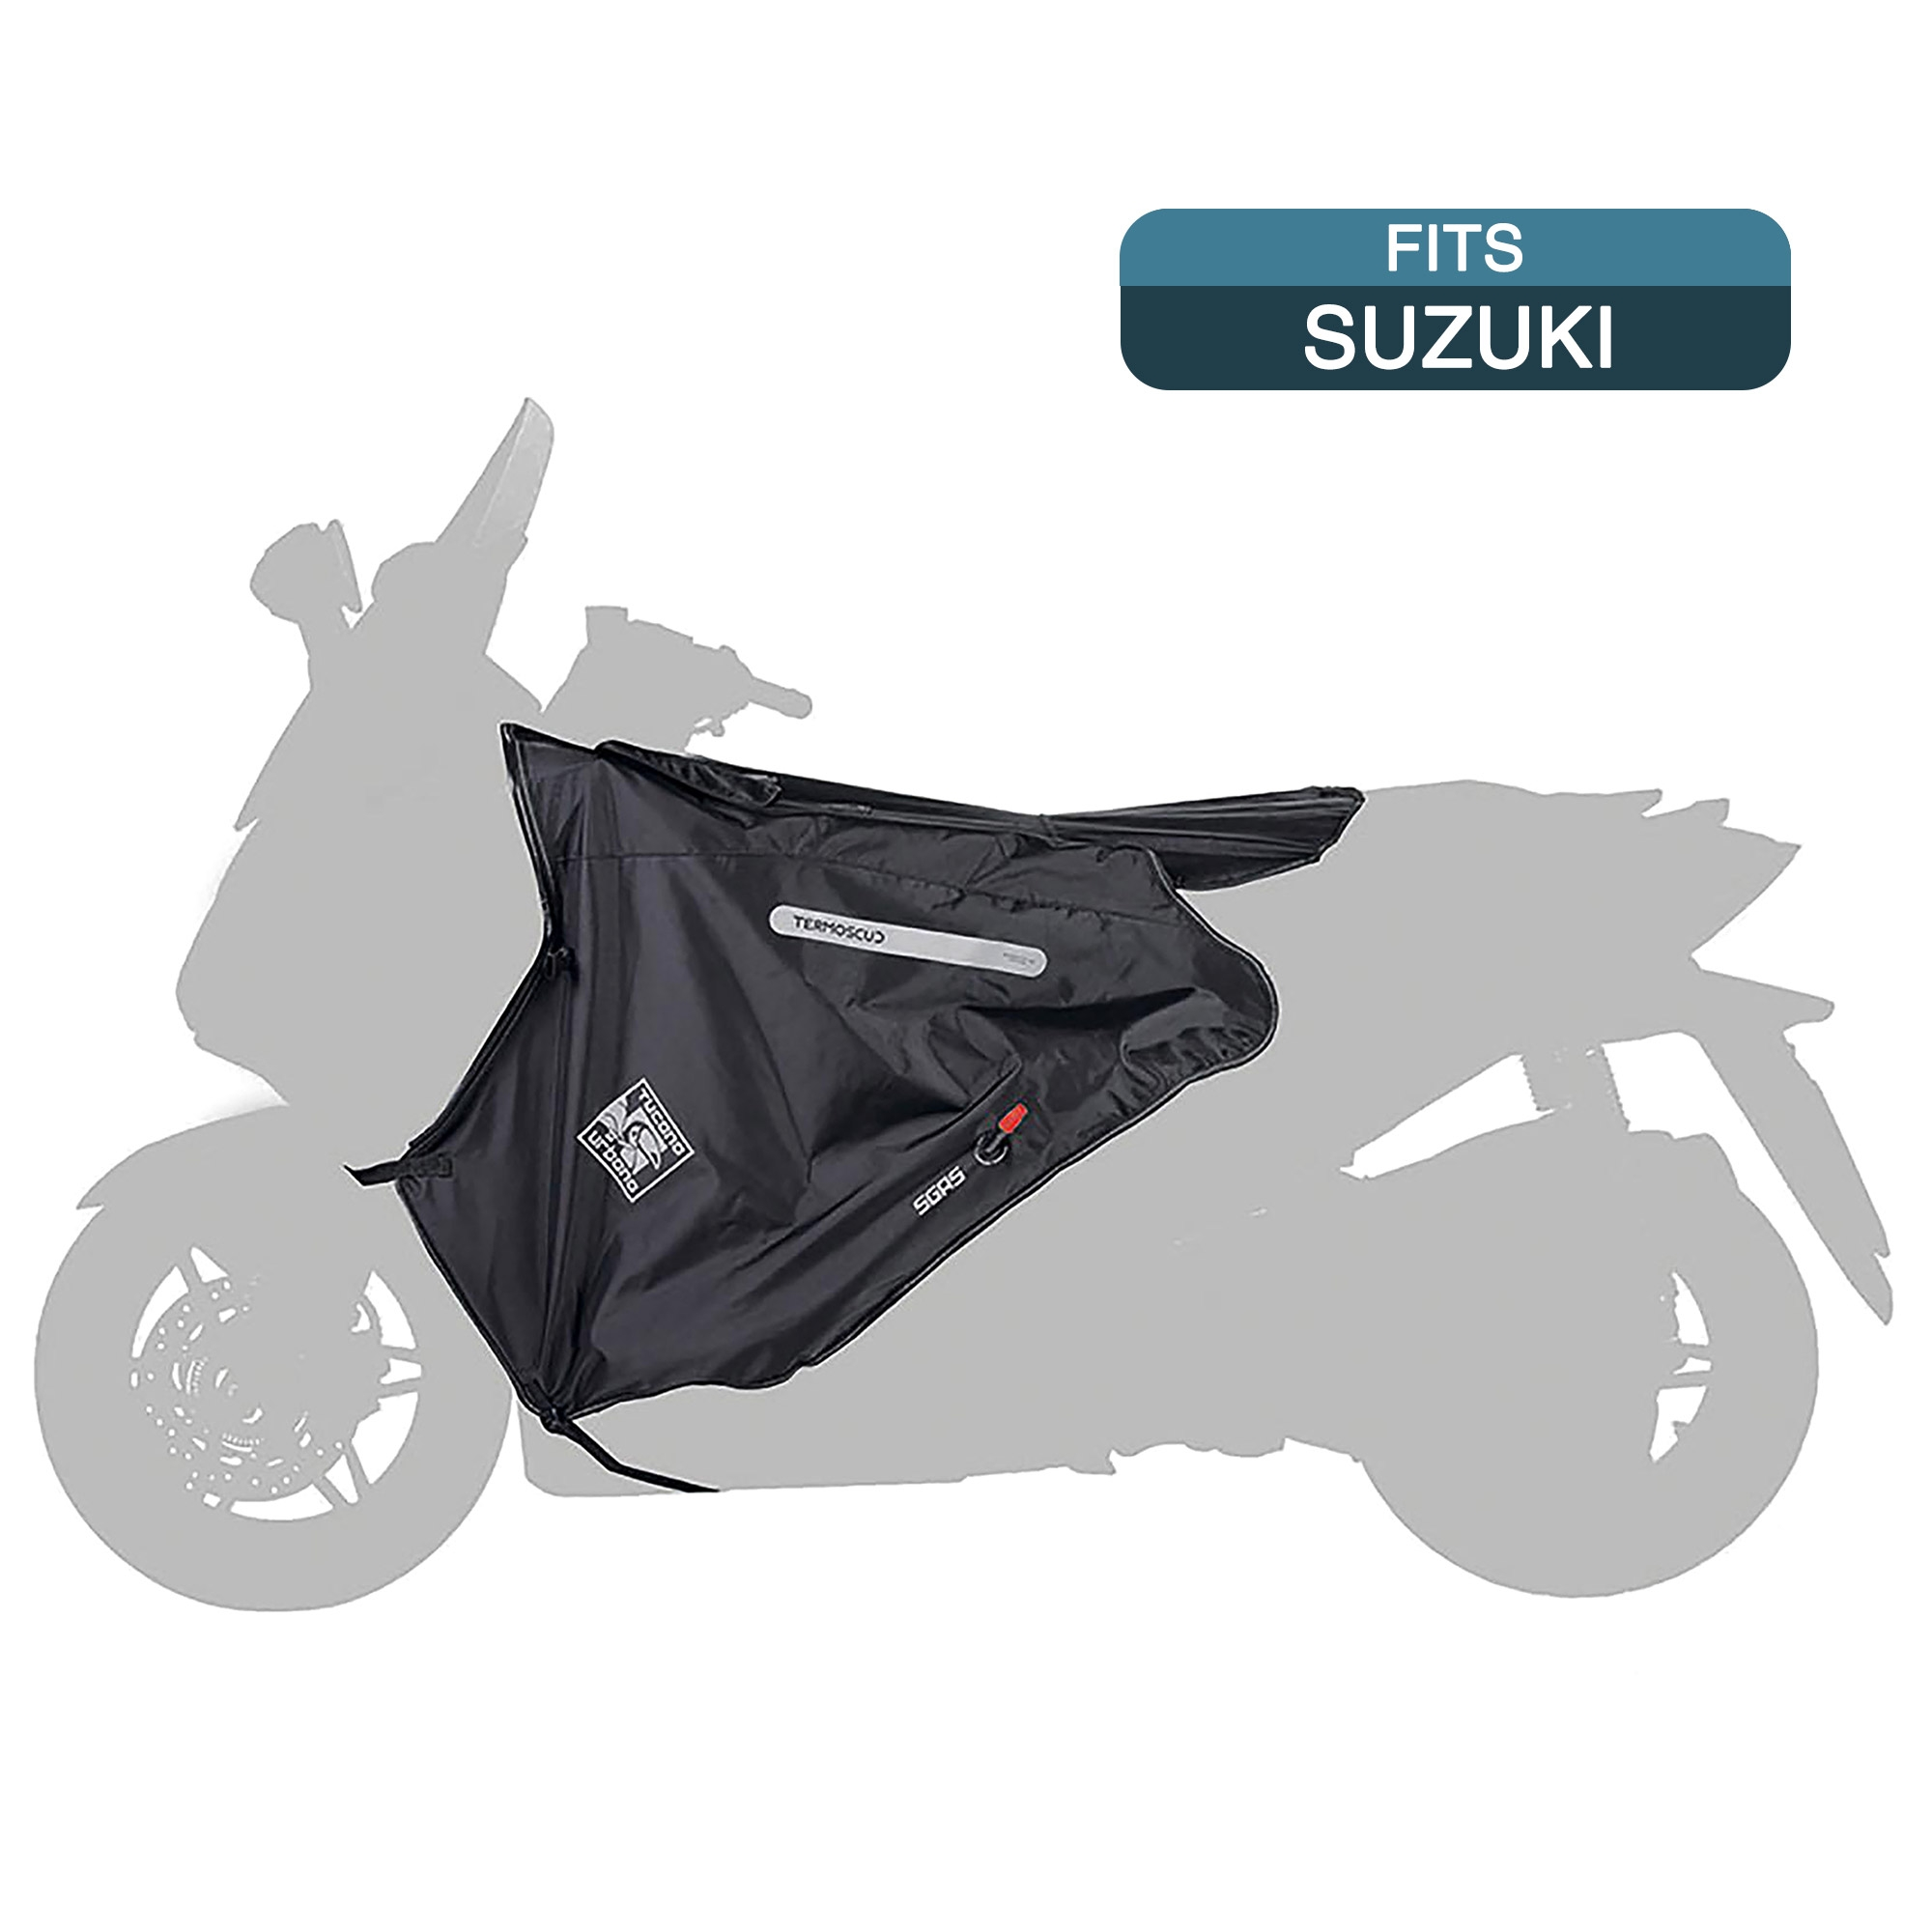 Jet Motorcycle Motorbike Jacket Mens Waterproof Armoured High Performance DAYTONA , Blue 38-40 M